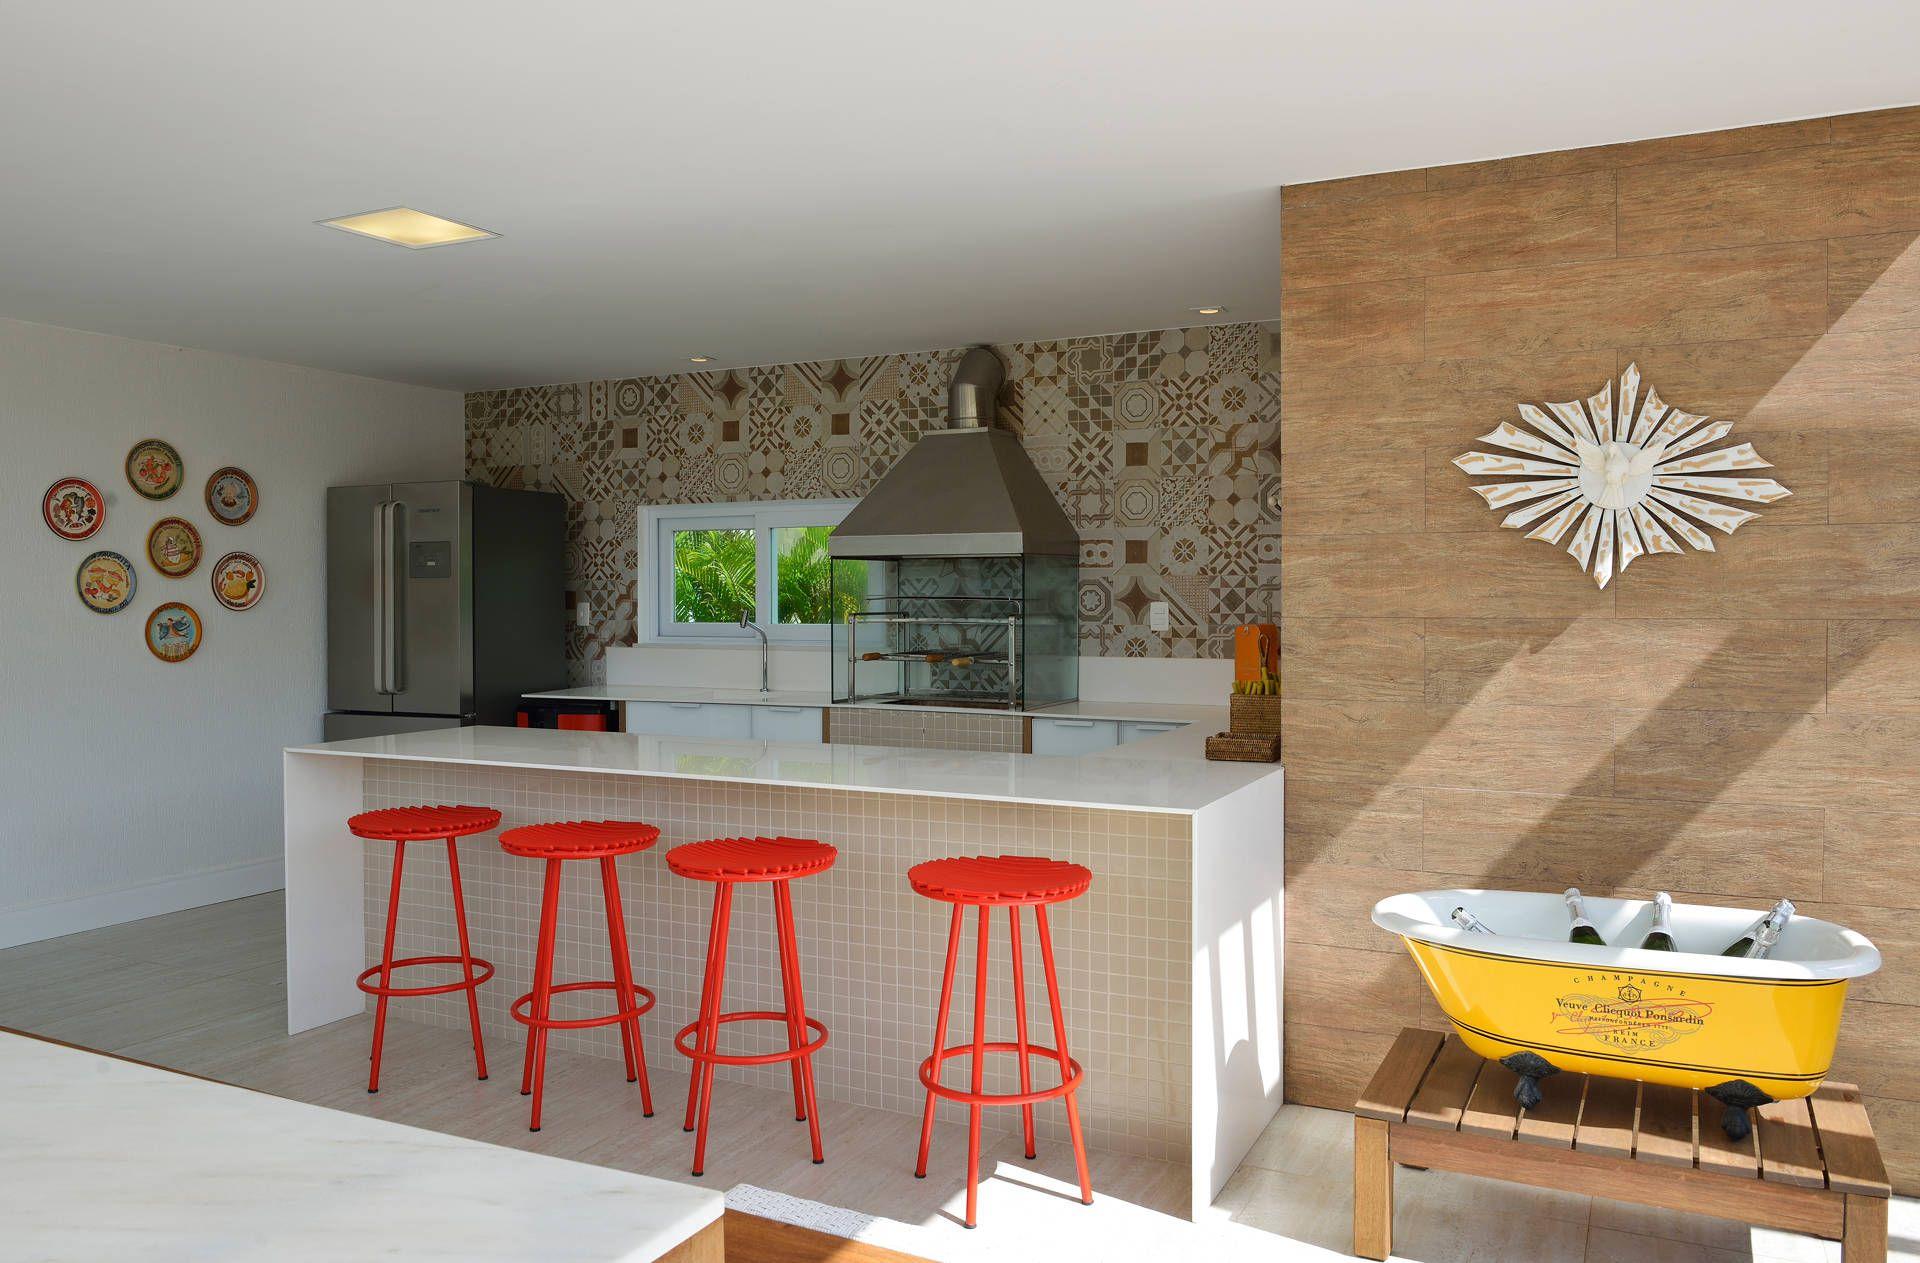 Espaço gourmet : Balcone, Veranda & Terrazza in stile moderno di Pinheiro Martinez Arquitetura